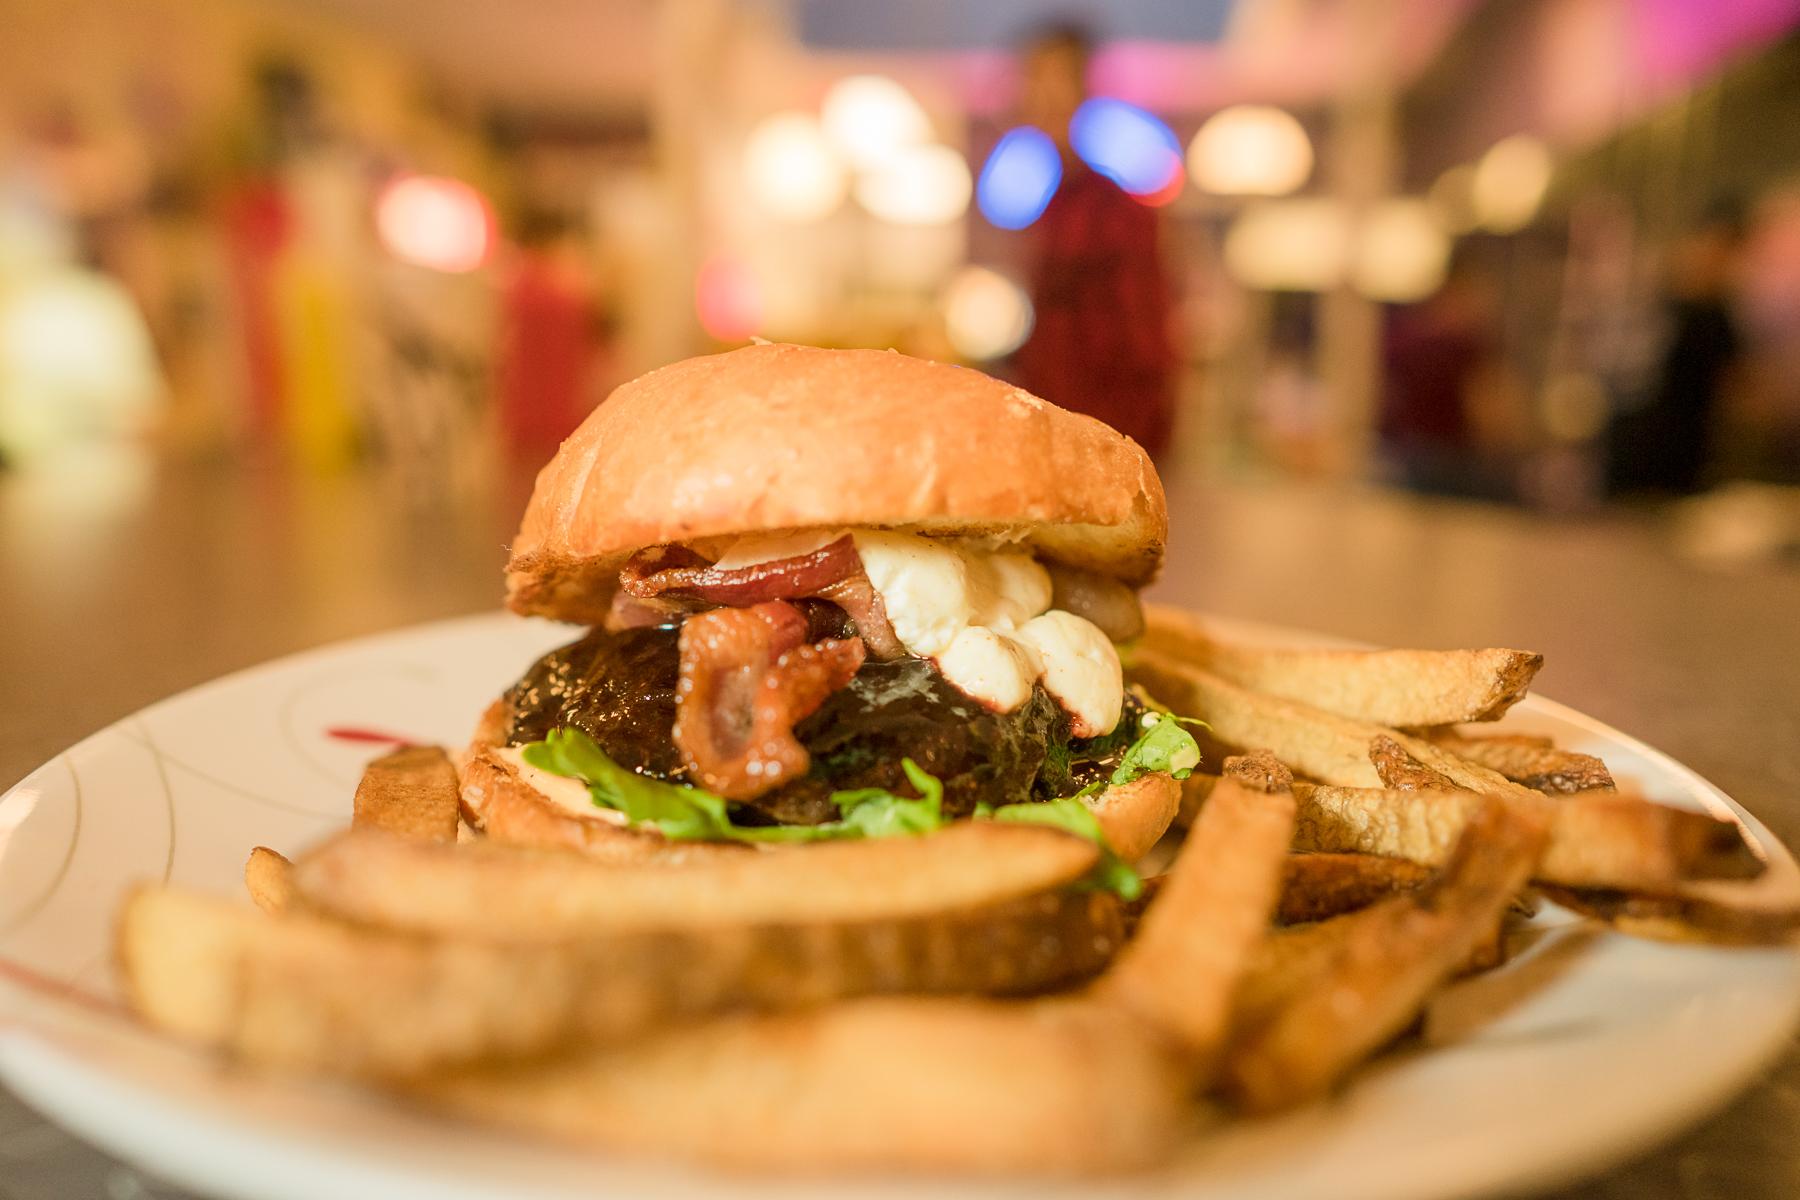 A7ii_20161020_7687, paul bellinger billings montana headshot photographer, burger dive fb.jpg